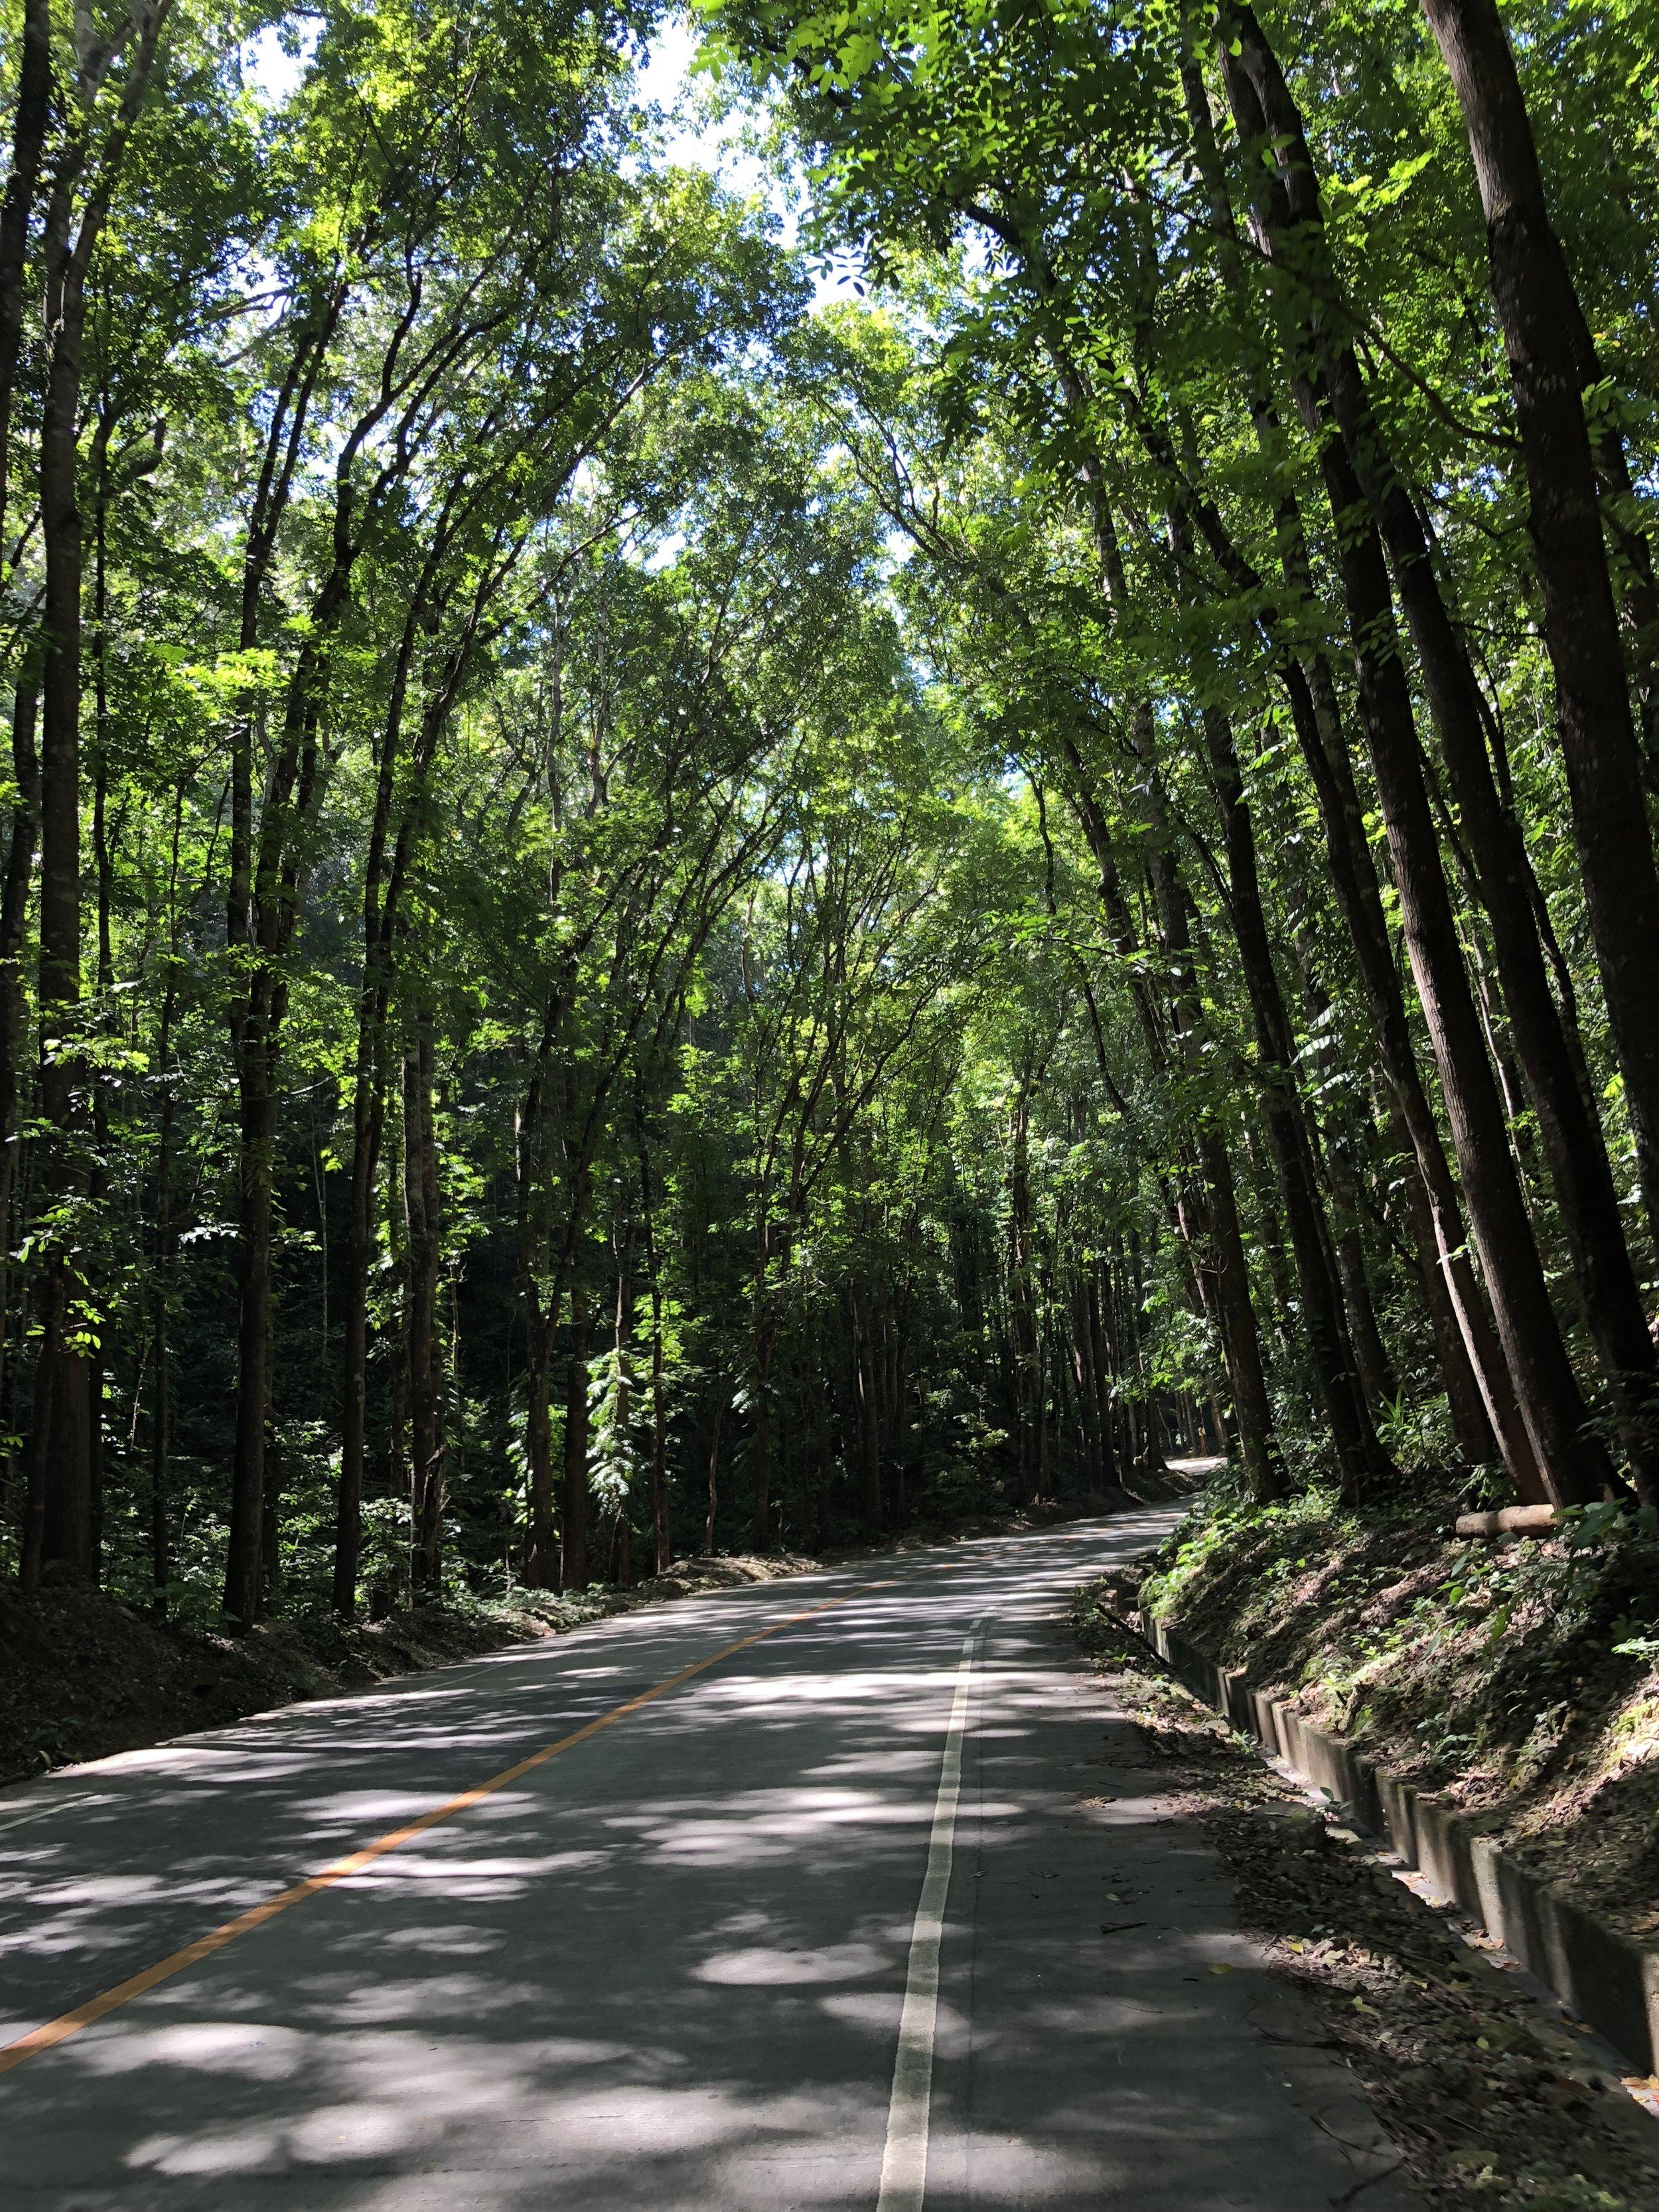 The Bohol Mahogany Forest in the Philippines. boldlygotravel.com